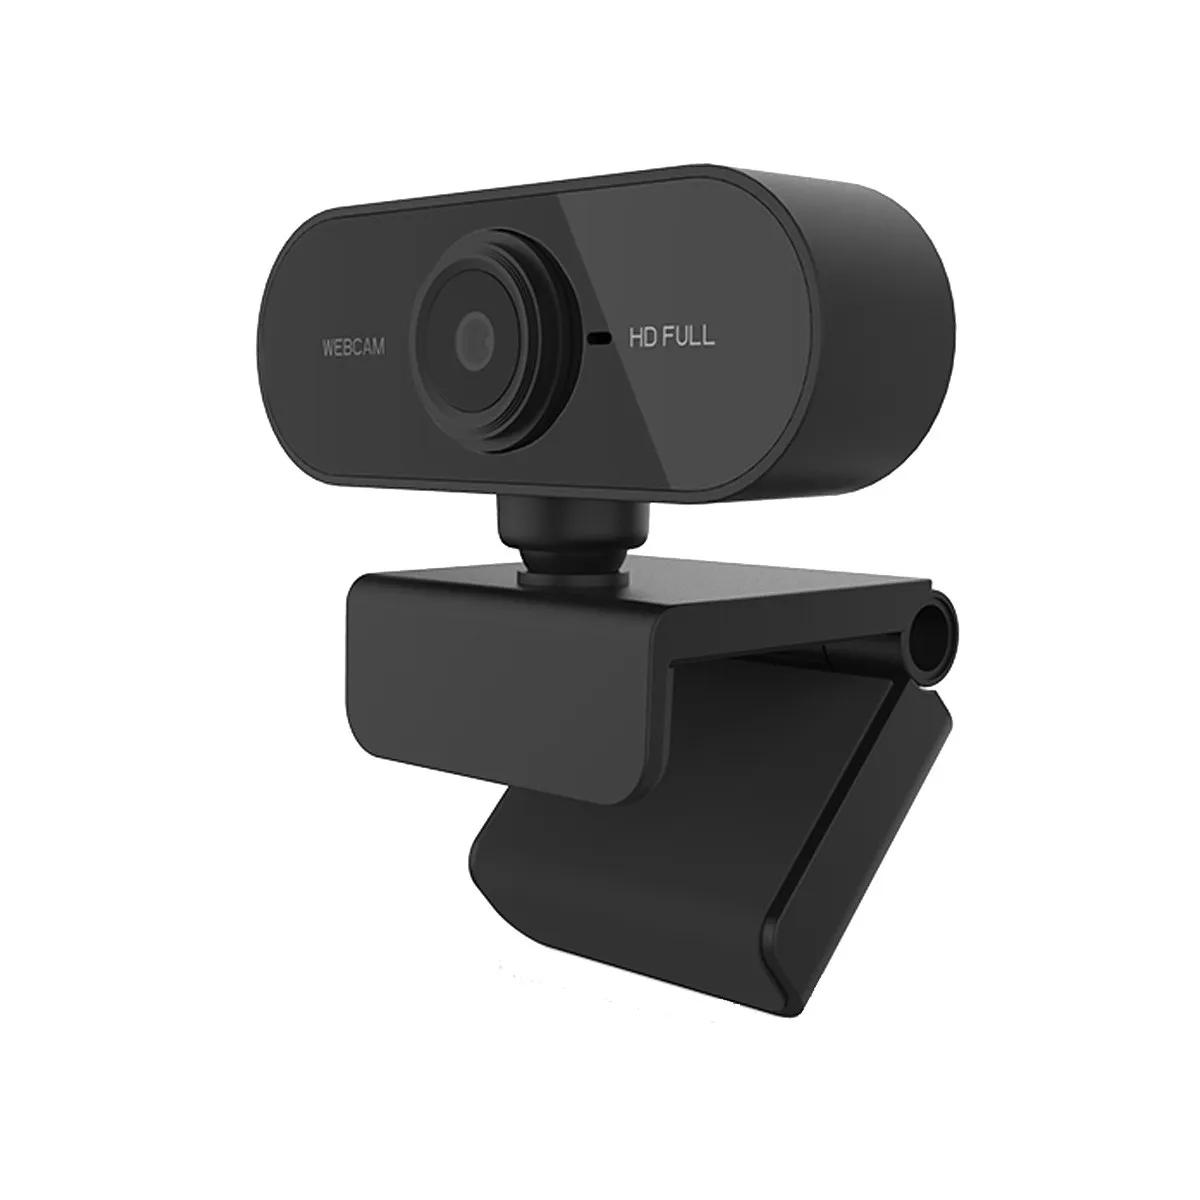 Kit c/ 4 Webcams Full HD 1080p com Microfone USB 2.0